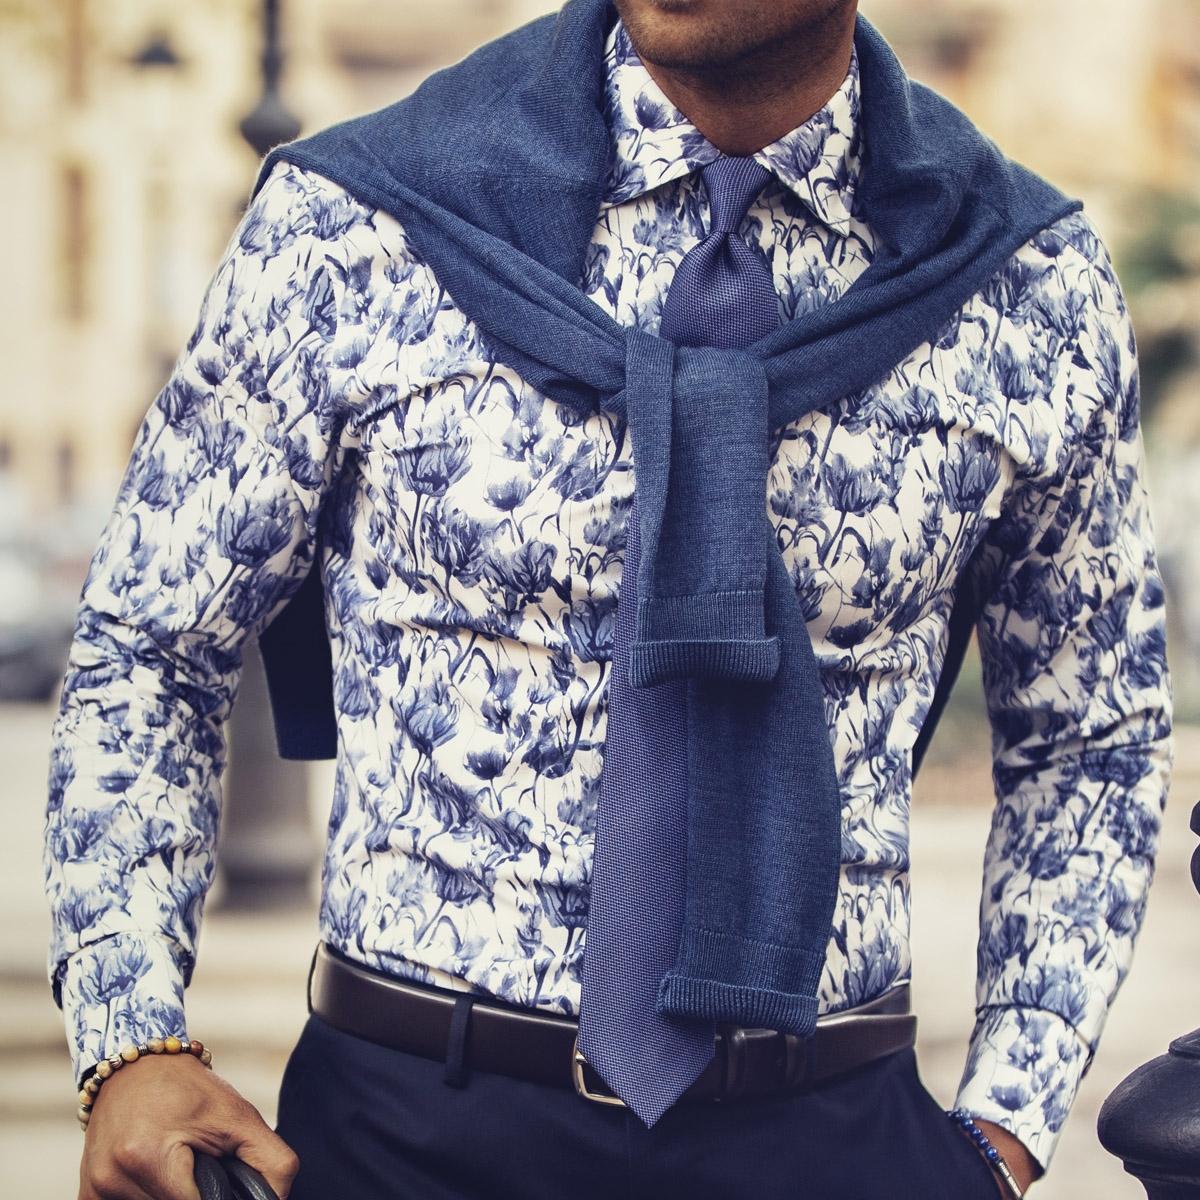 john henric patterned shirt